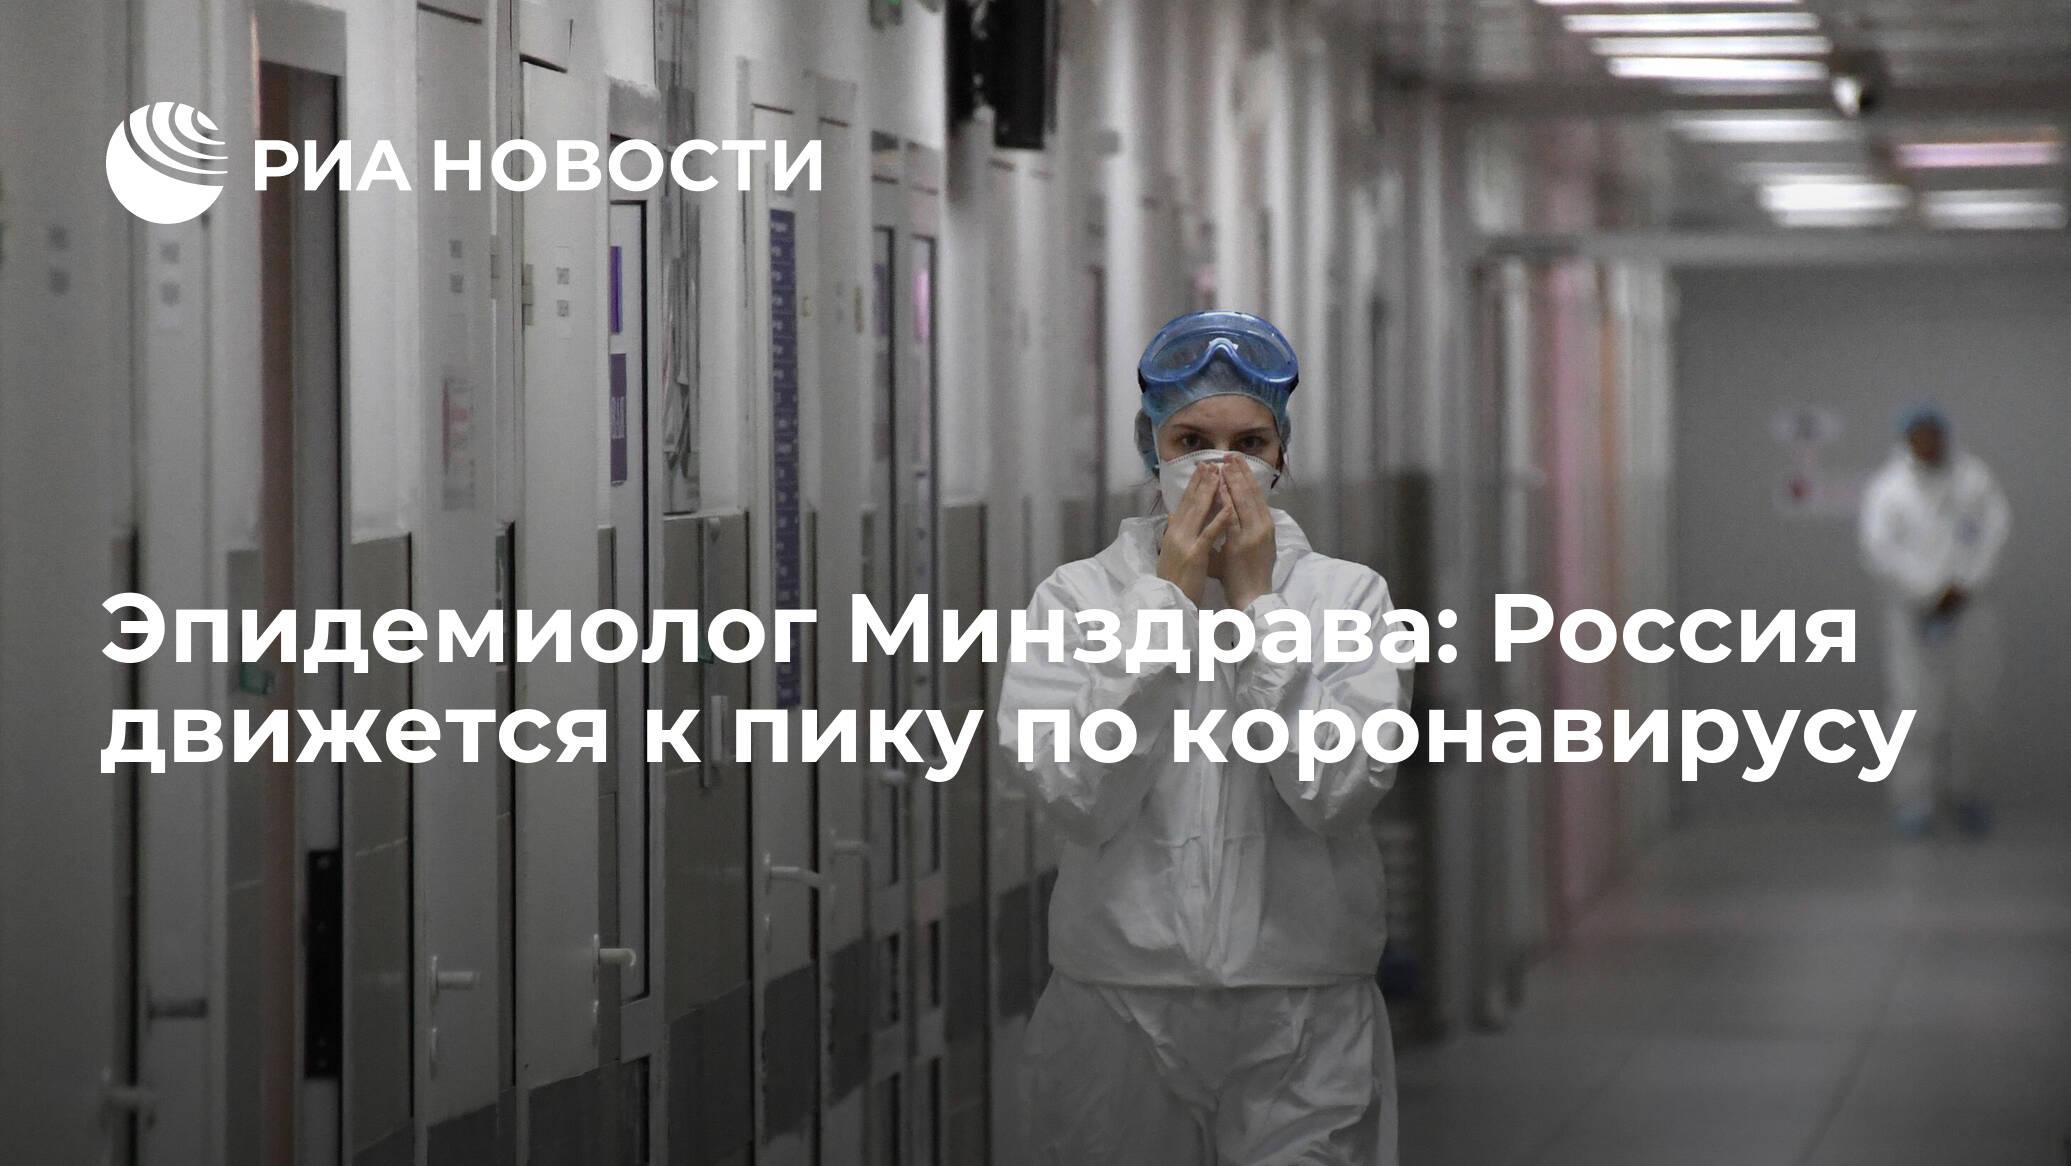 Минздрав предупредил россиян о пике заражений коронавирусом